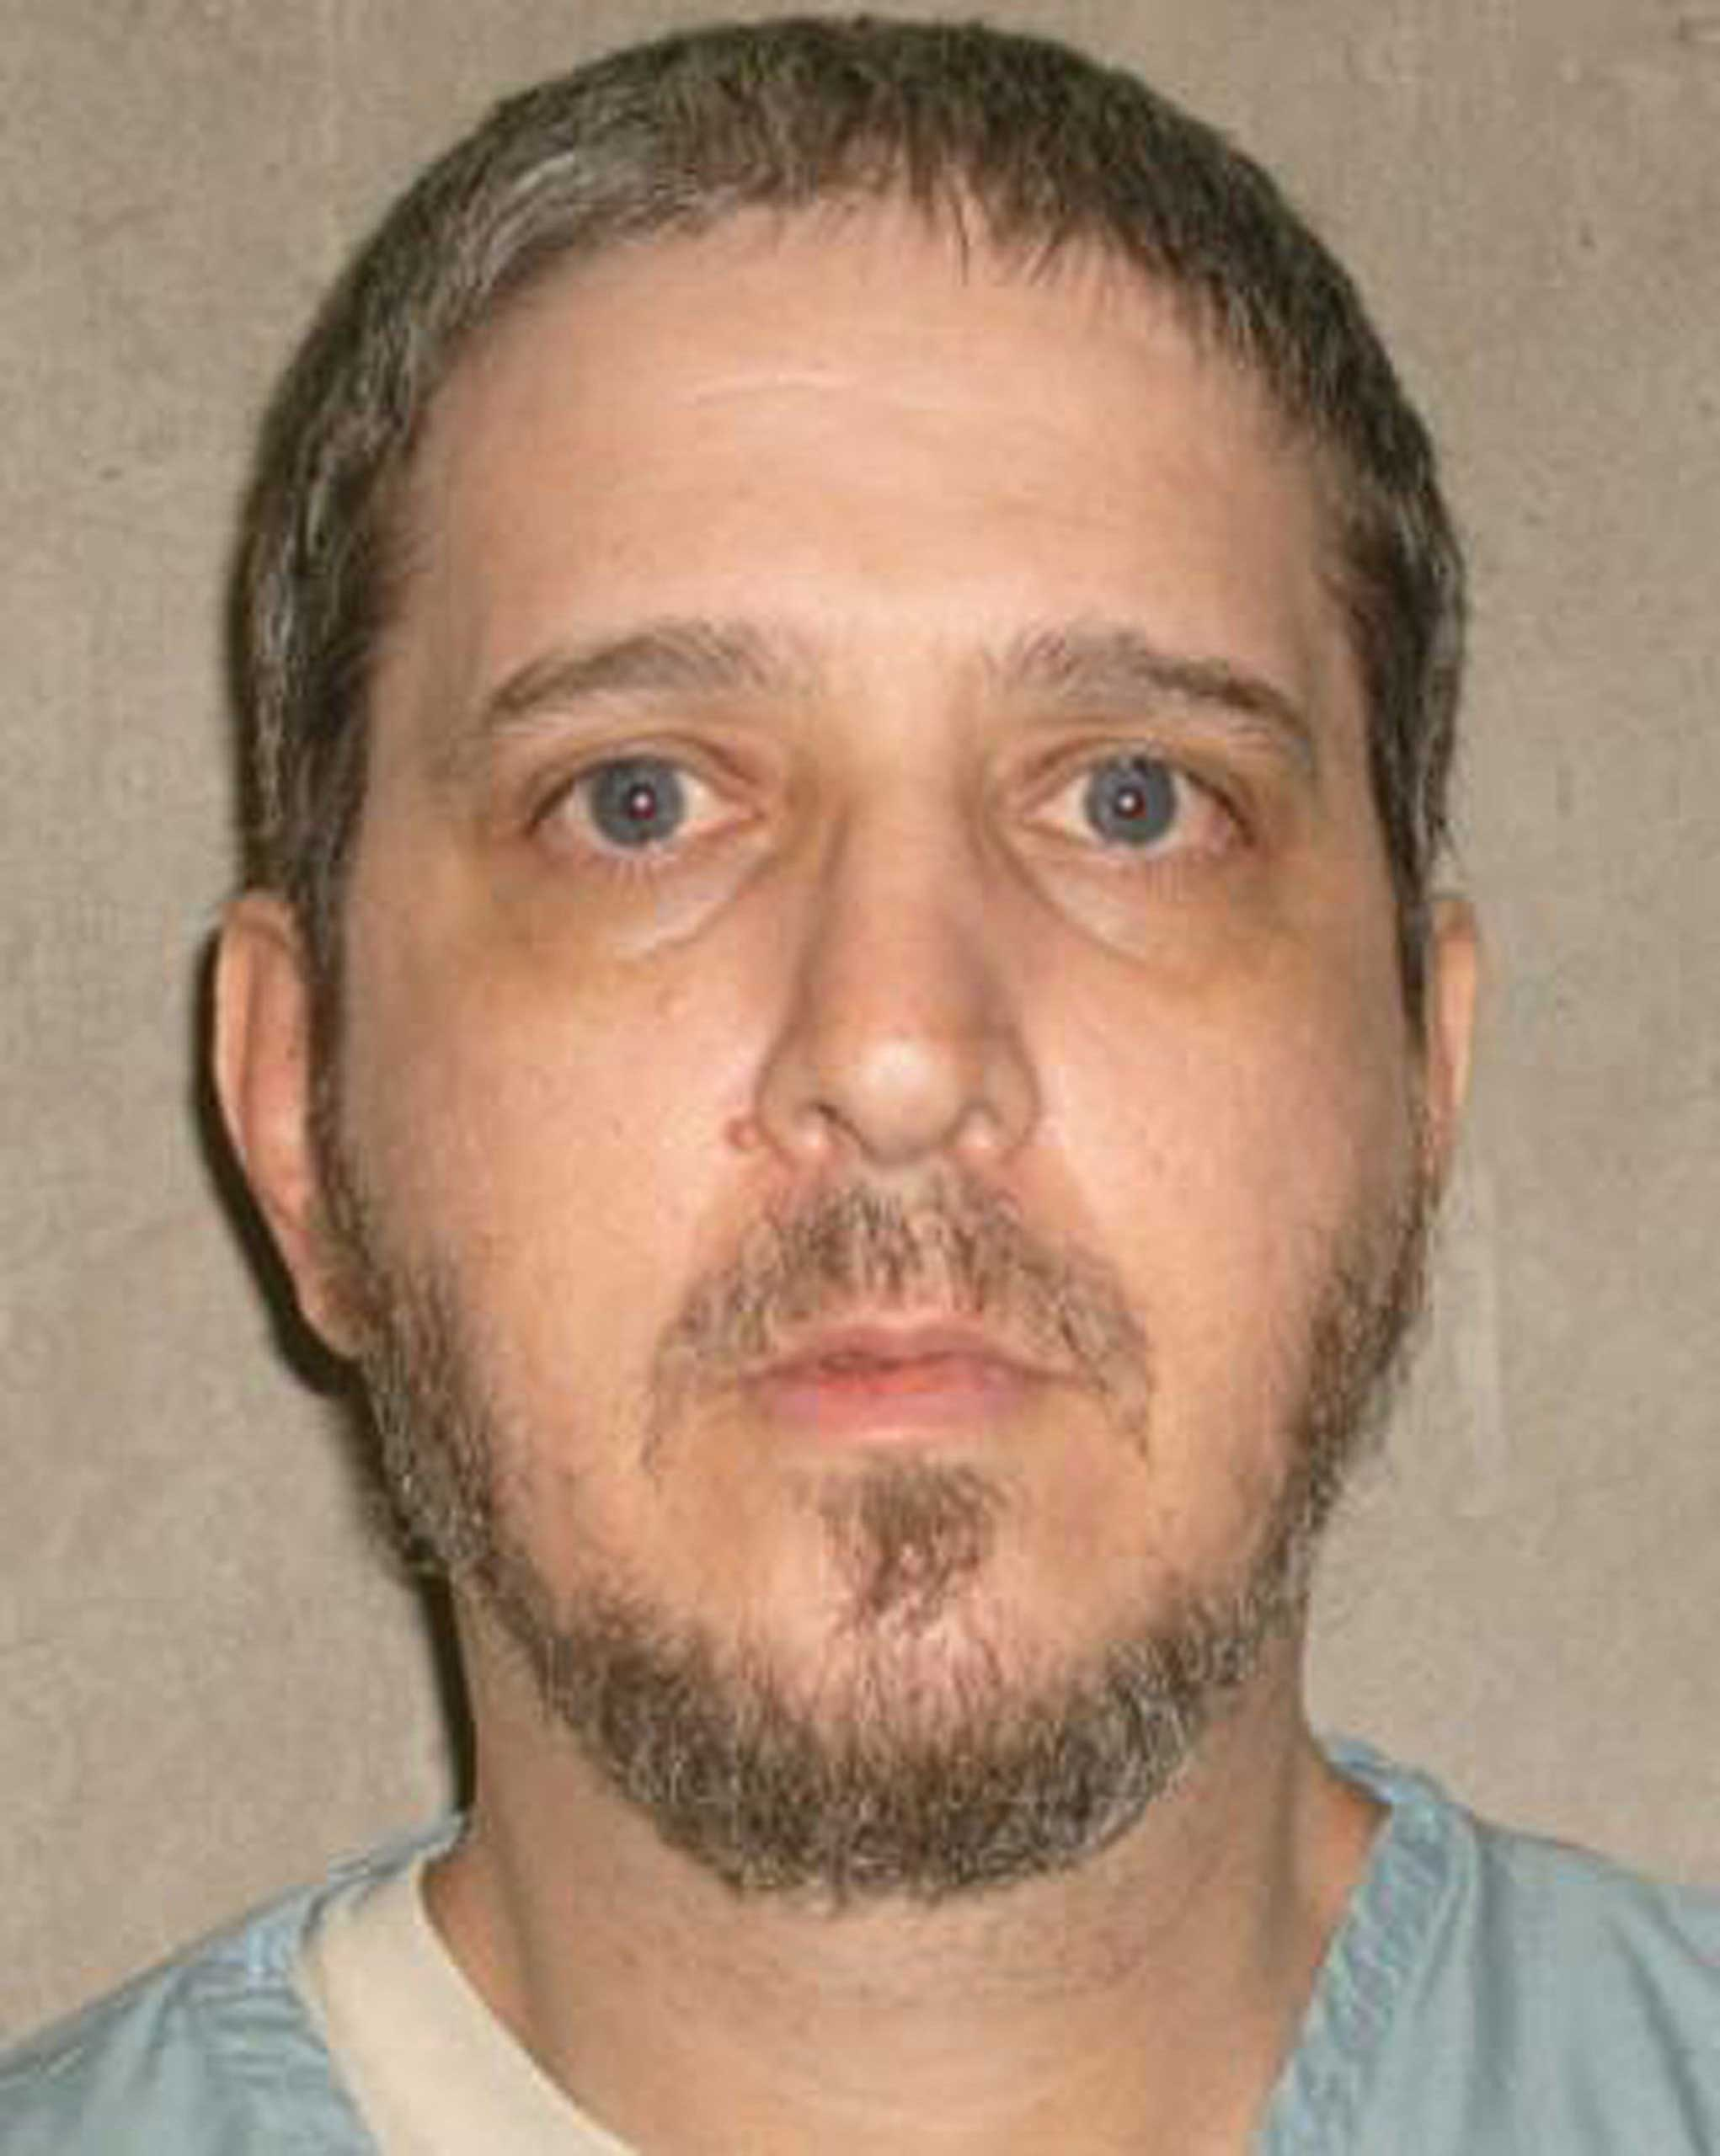 Death row inmate Richard E. Glossip.